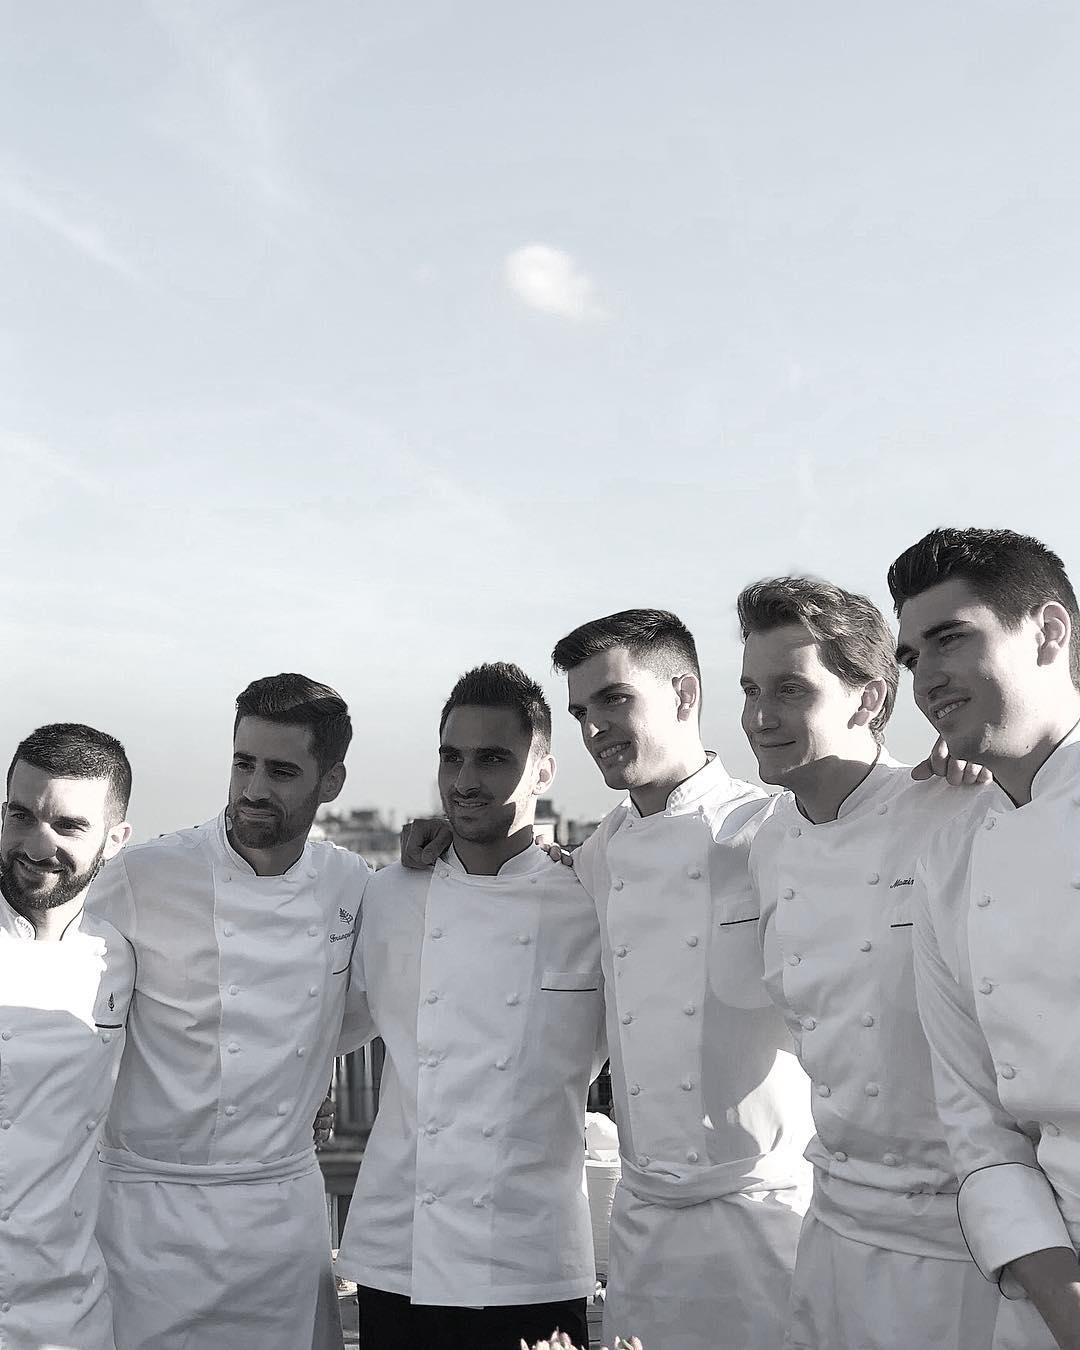 Maxime 與他的部分團隊成員合影。(照片來源:Instagram  @maxime.frederic )